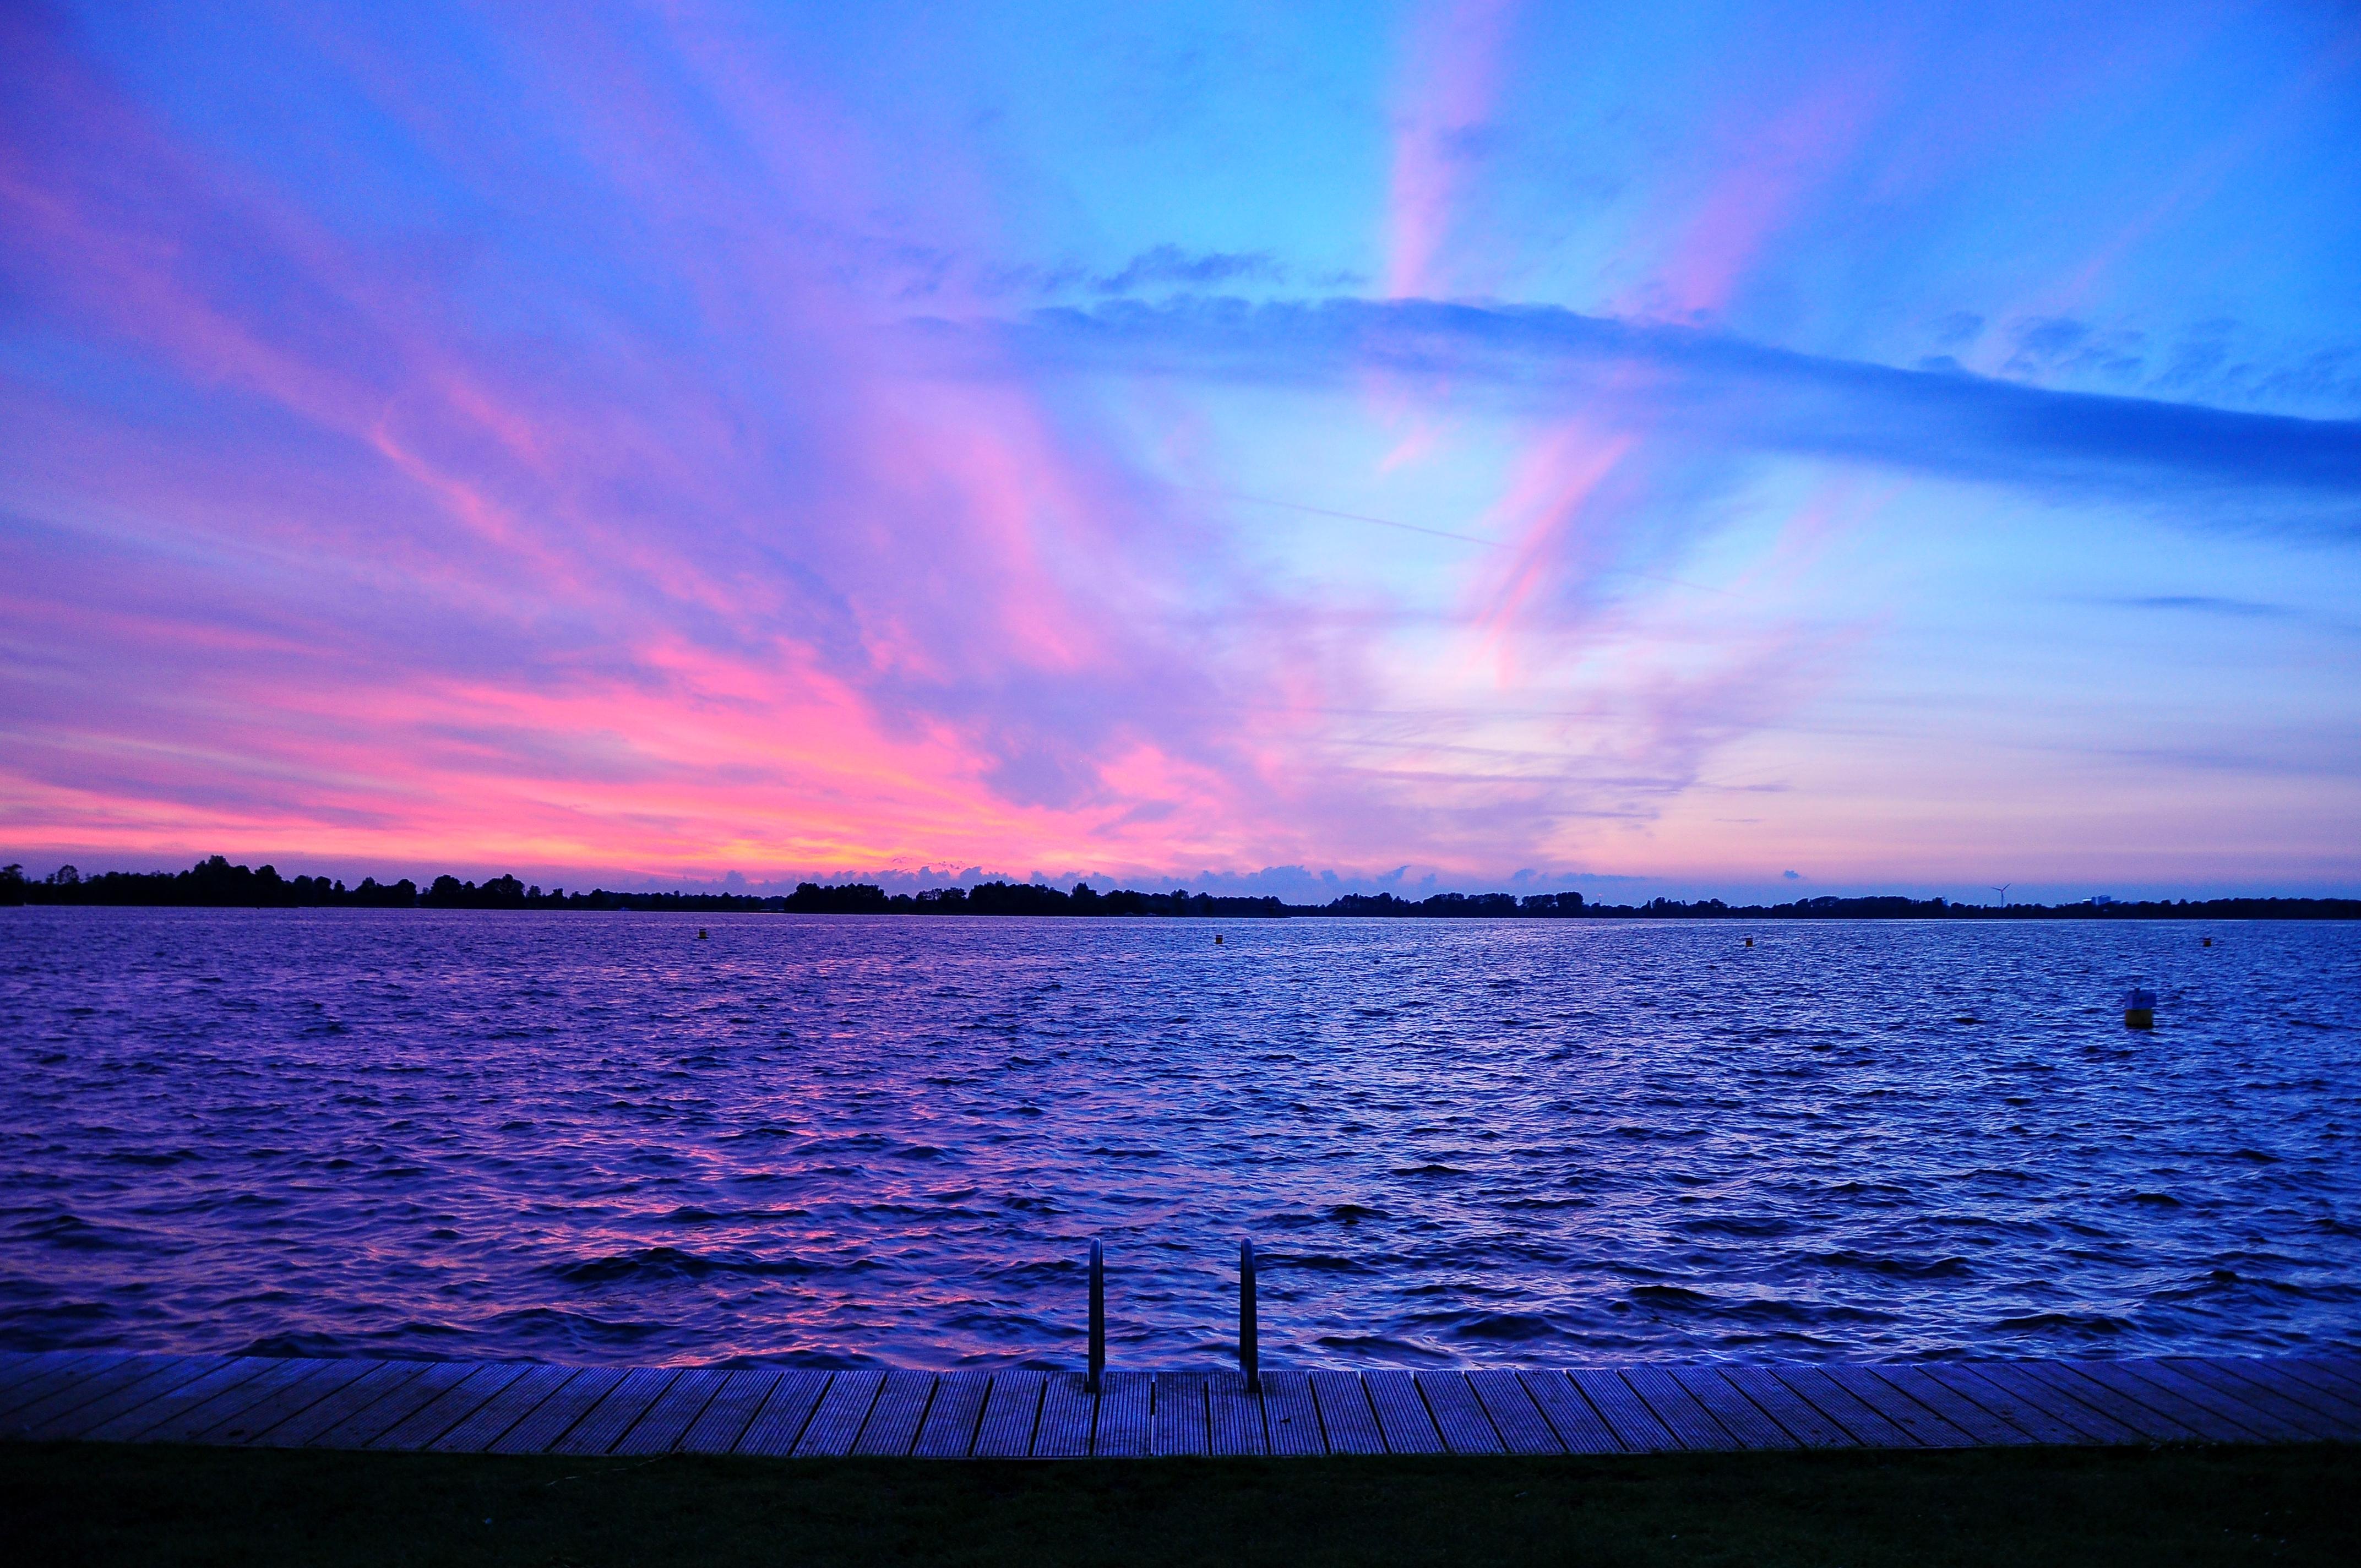 sea-water-ocean-horizon-cloud-sky-deck-s